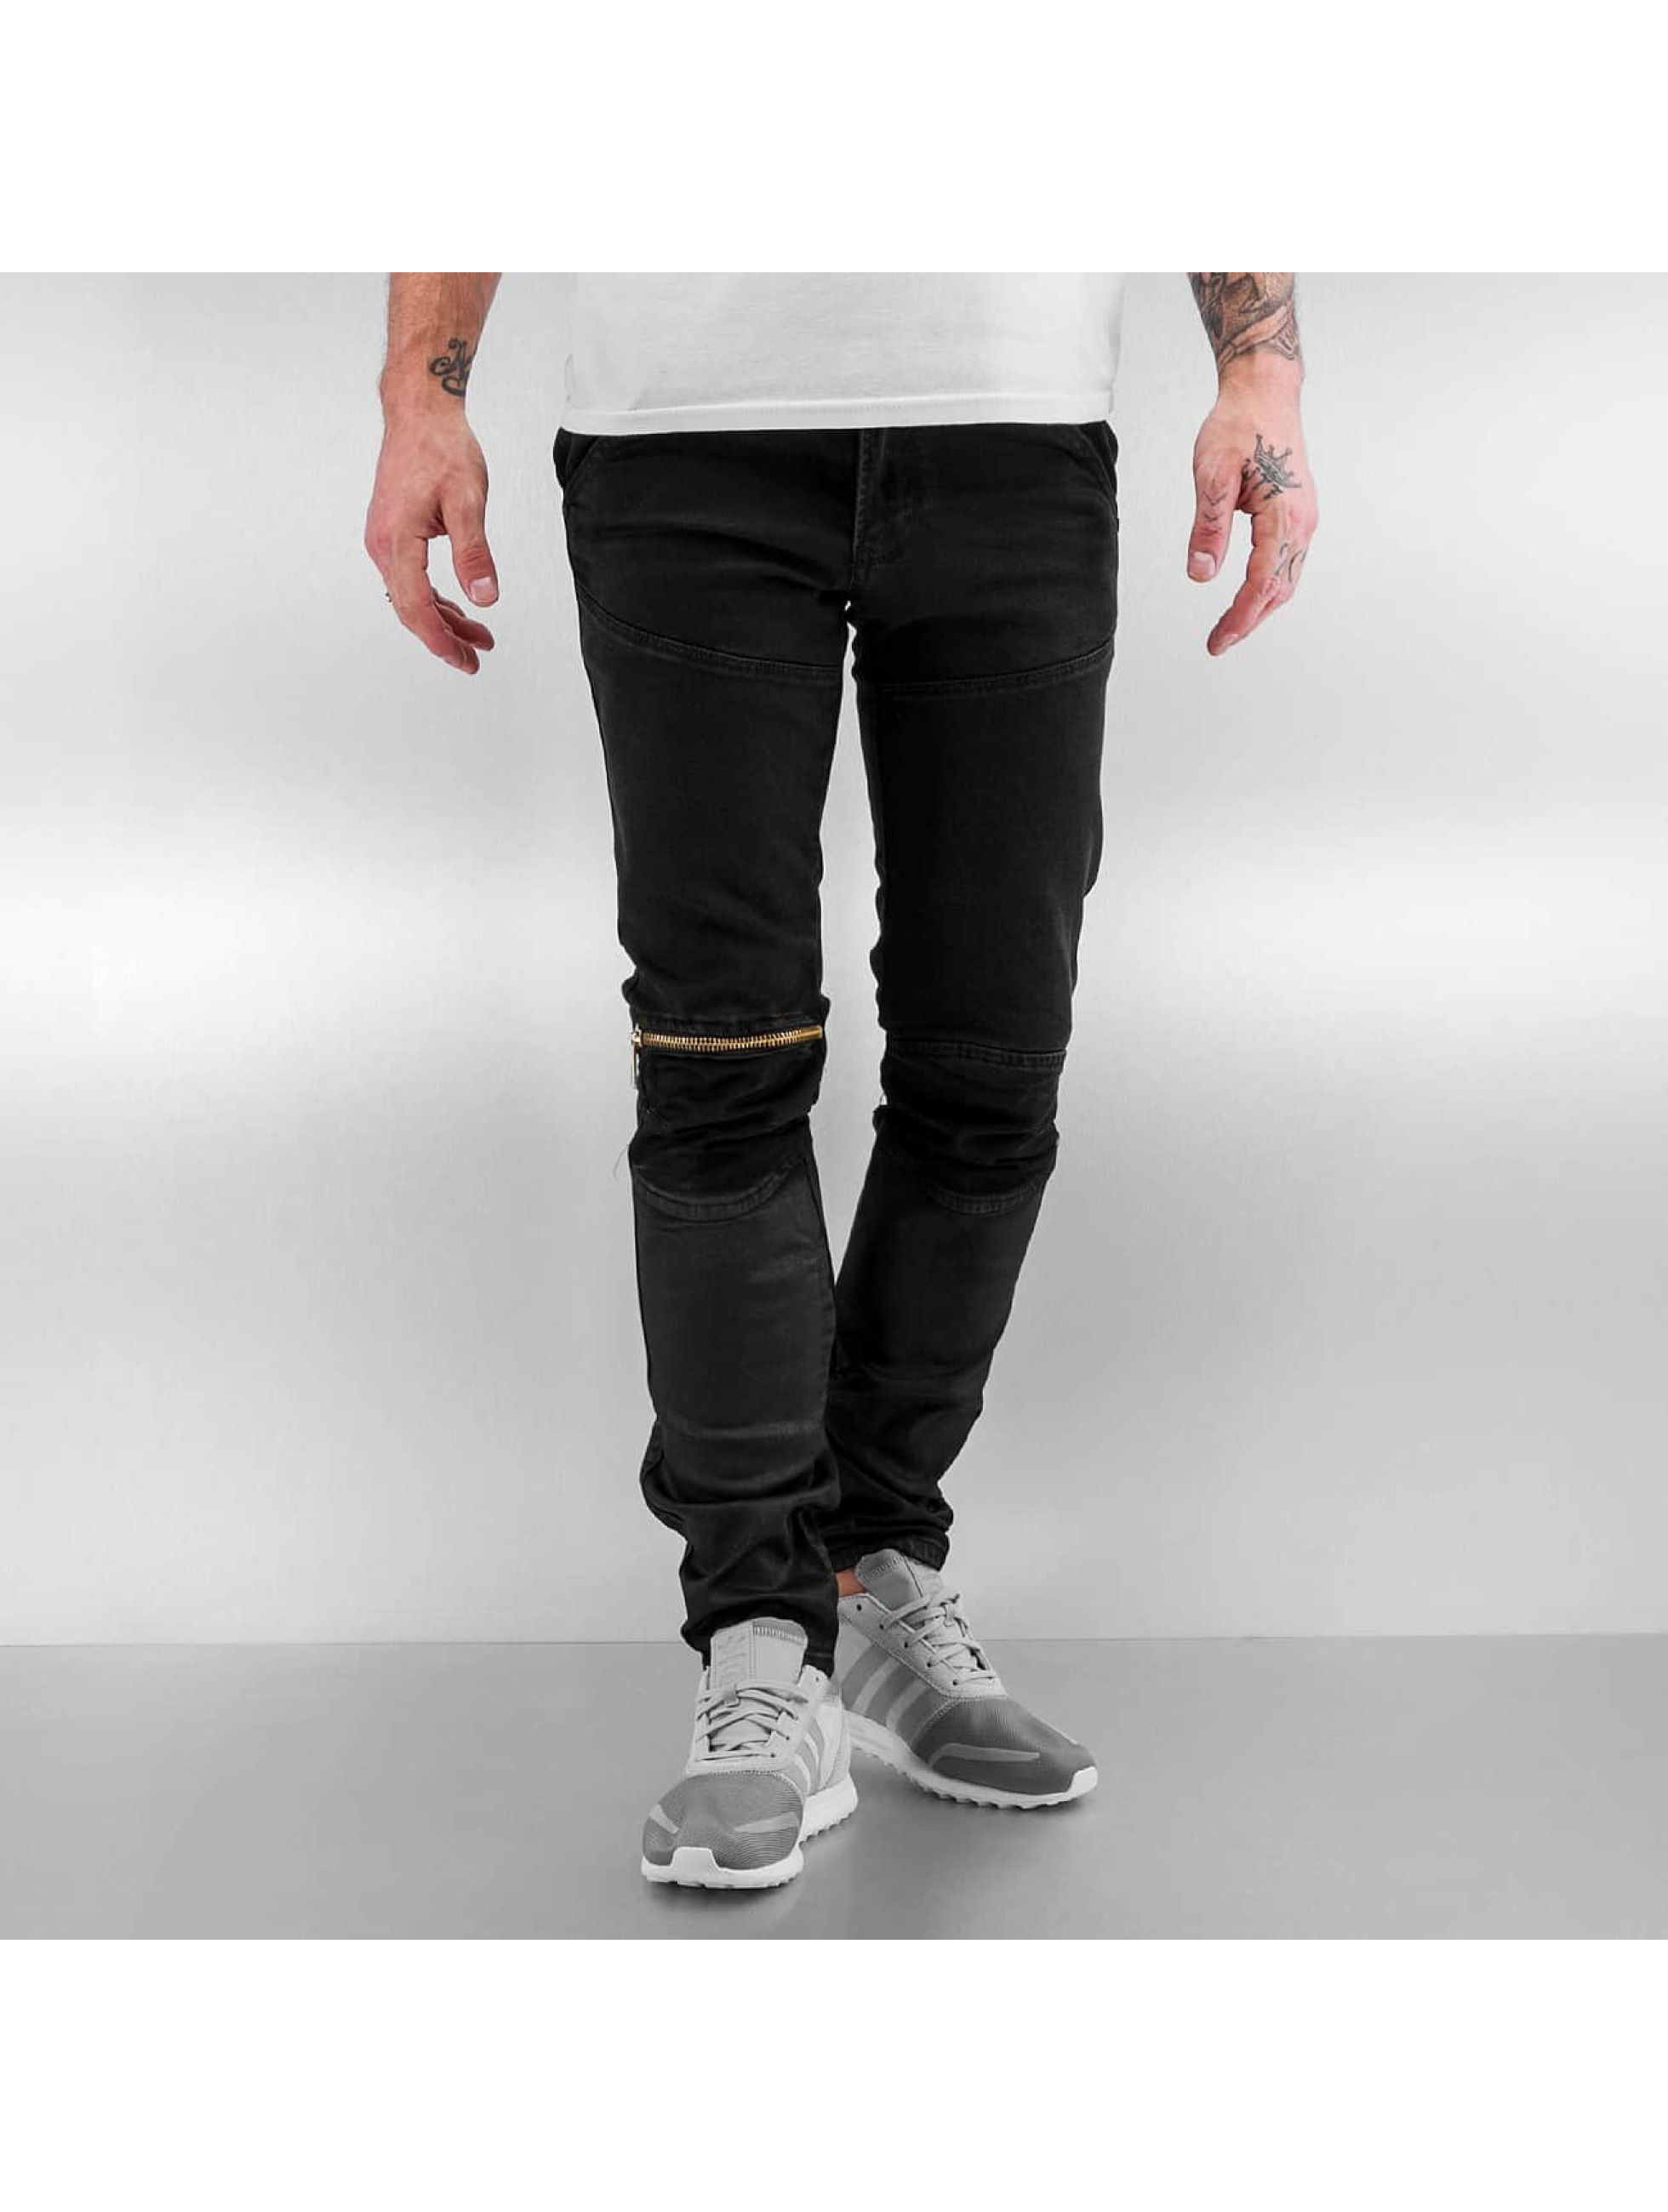 2Y / Skinny Jeans Biff in black W 30